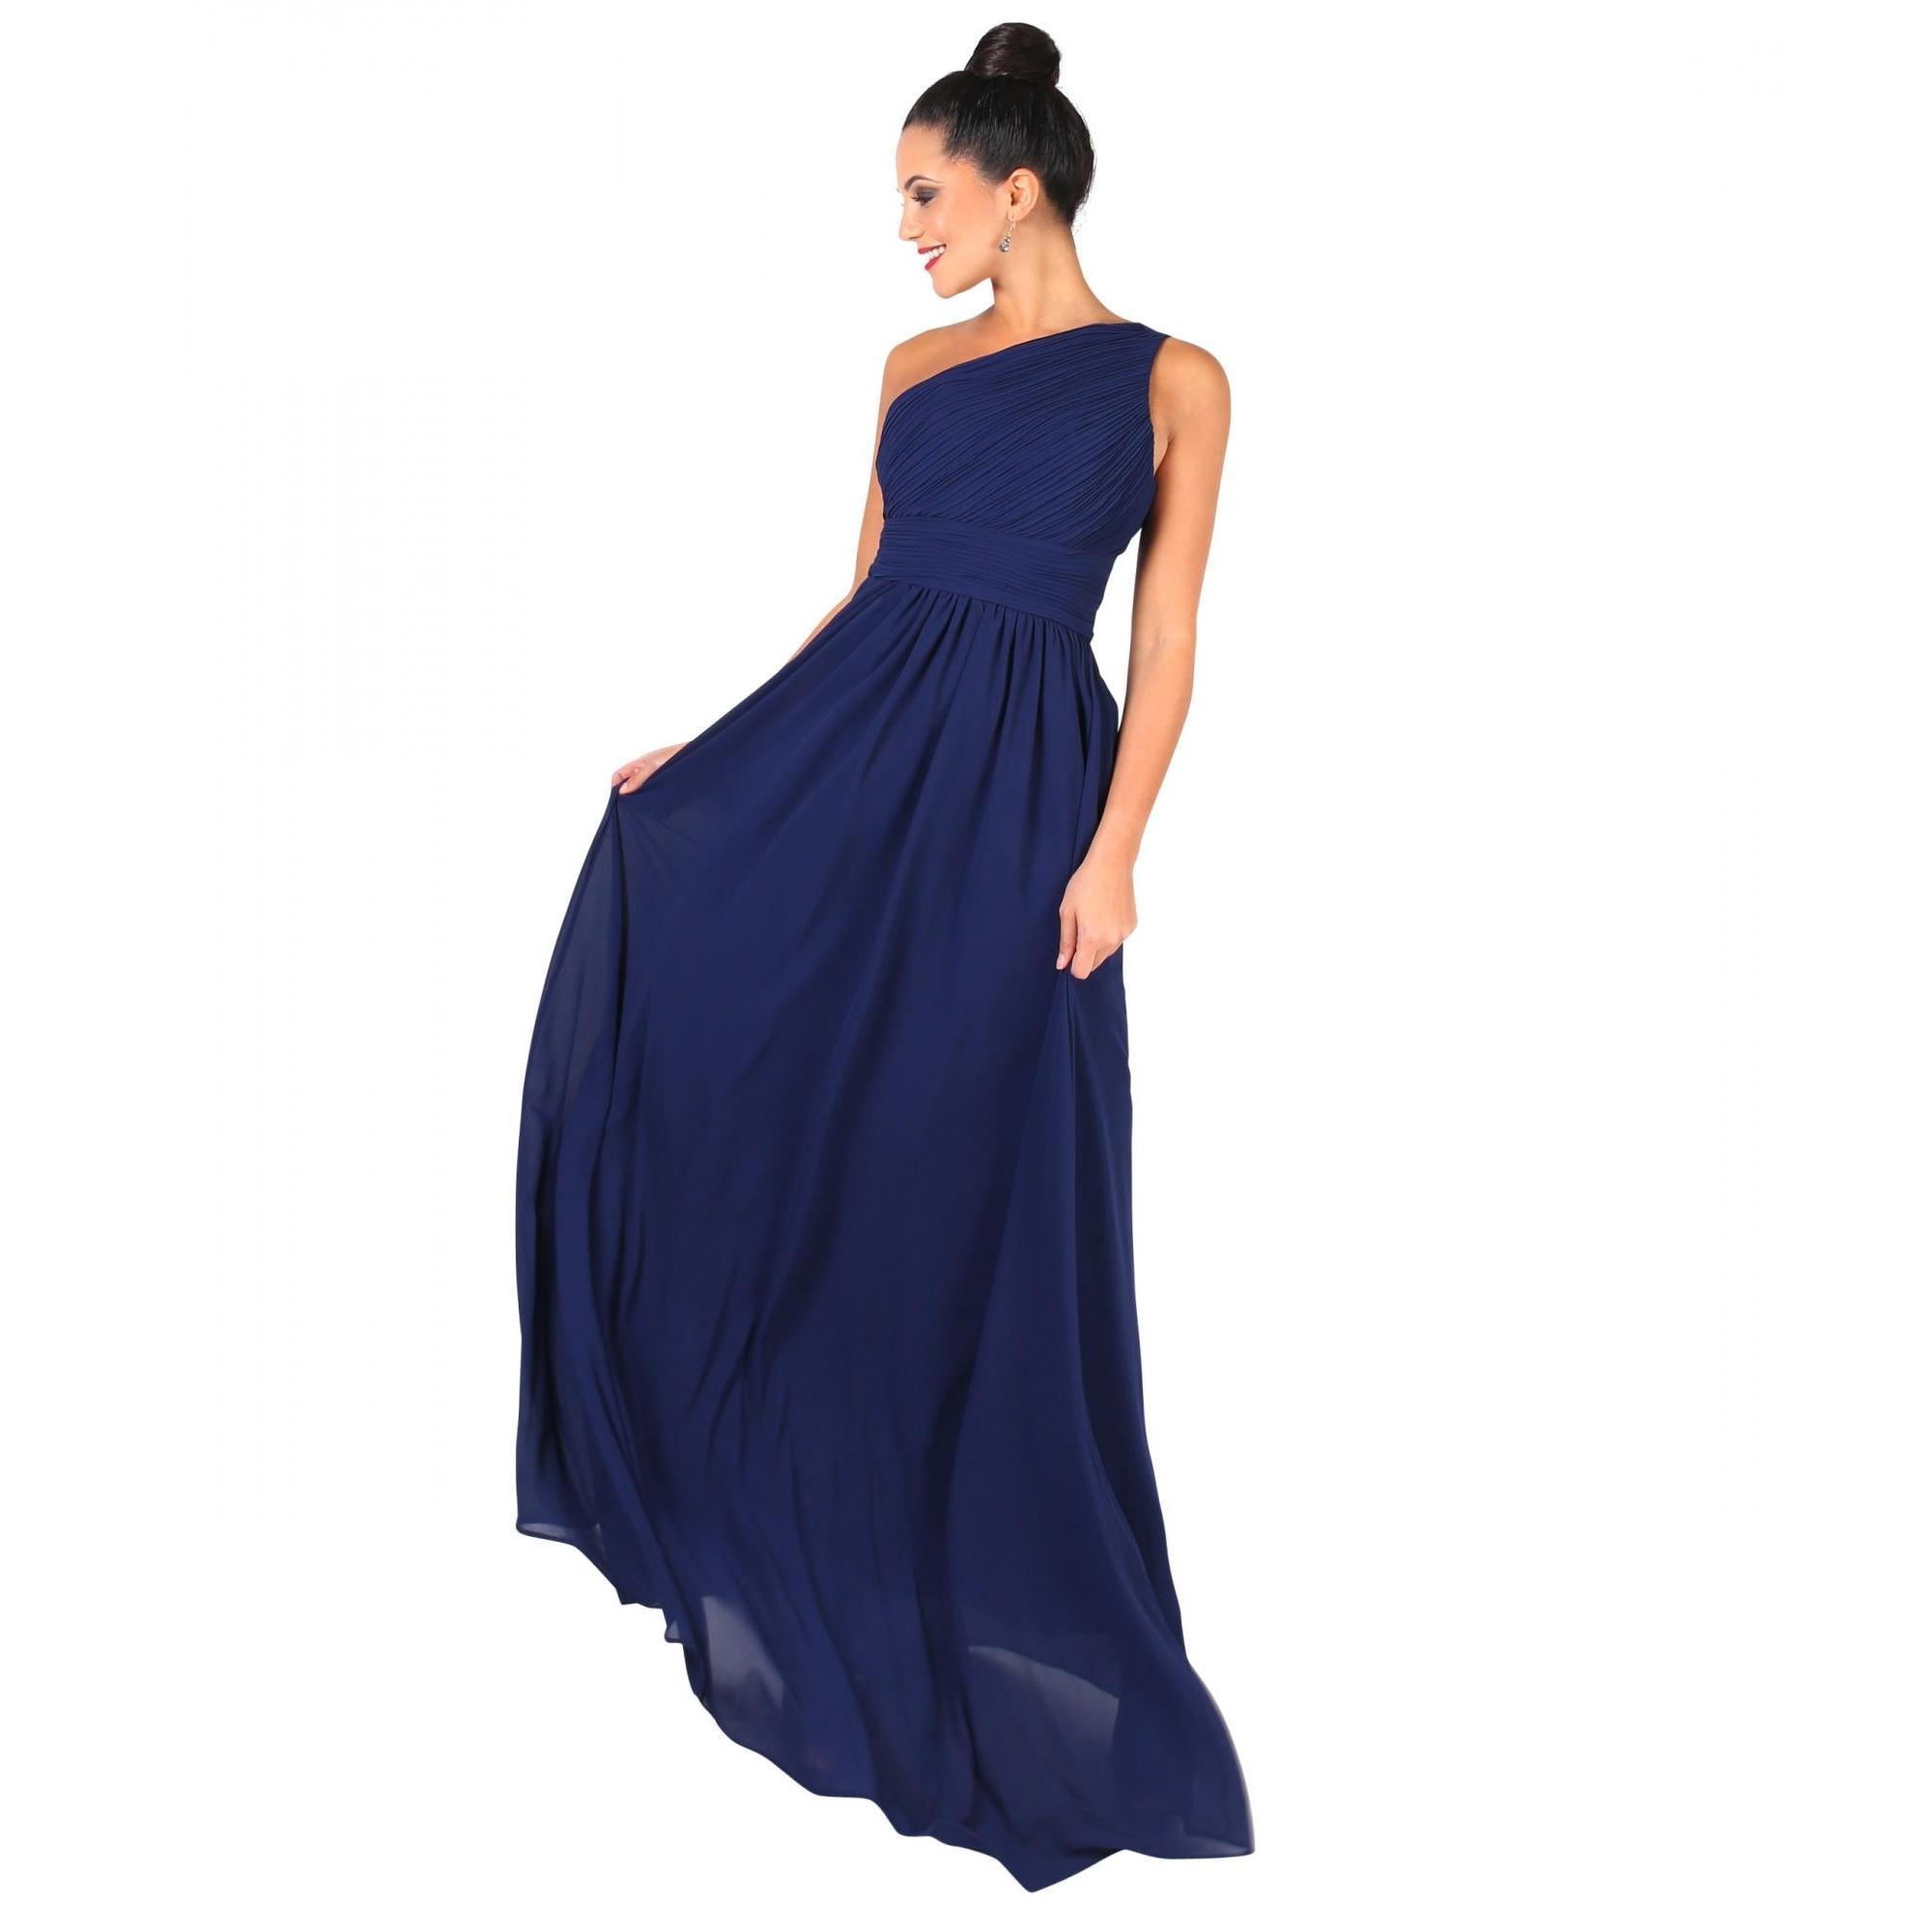 Krisp Womens/Ladies One Shoulder Evening Maxi Dress (16 UK) (Blue)